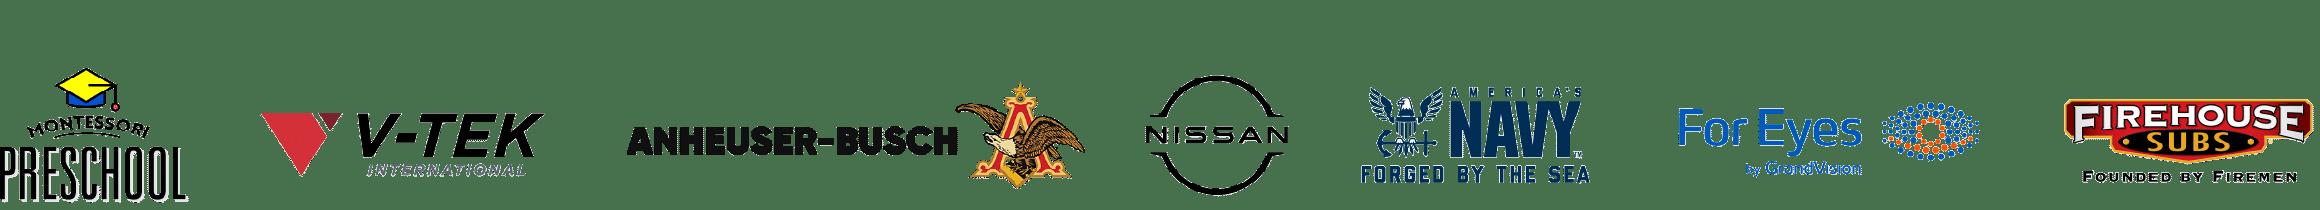 Sas-Logo-Grid-Alerts-Works_ForUs-Full